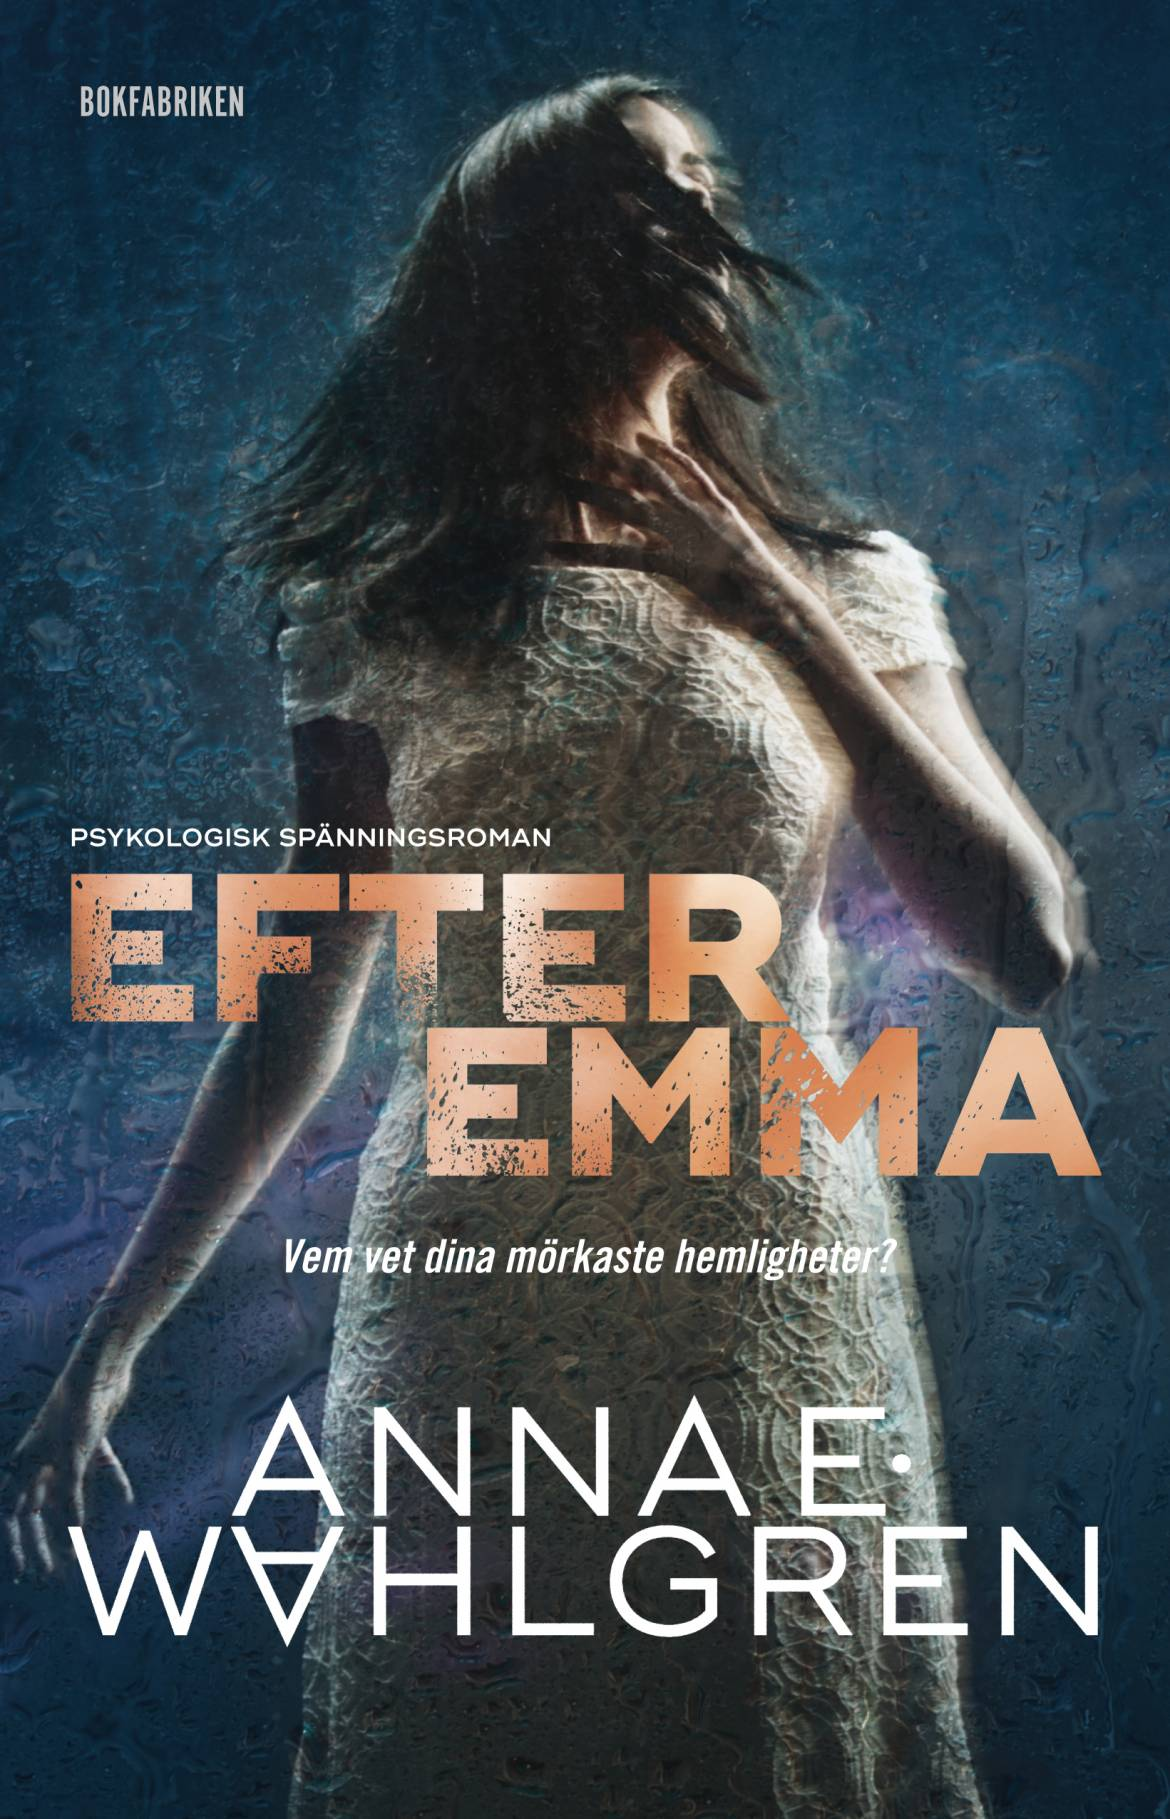 Wahlgren-Efter-Emma-9789176295823.jpg